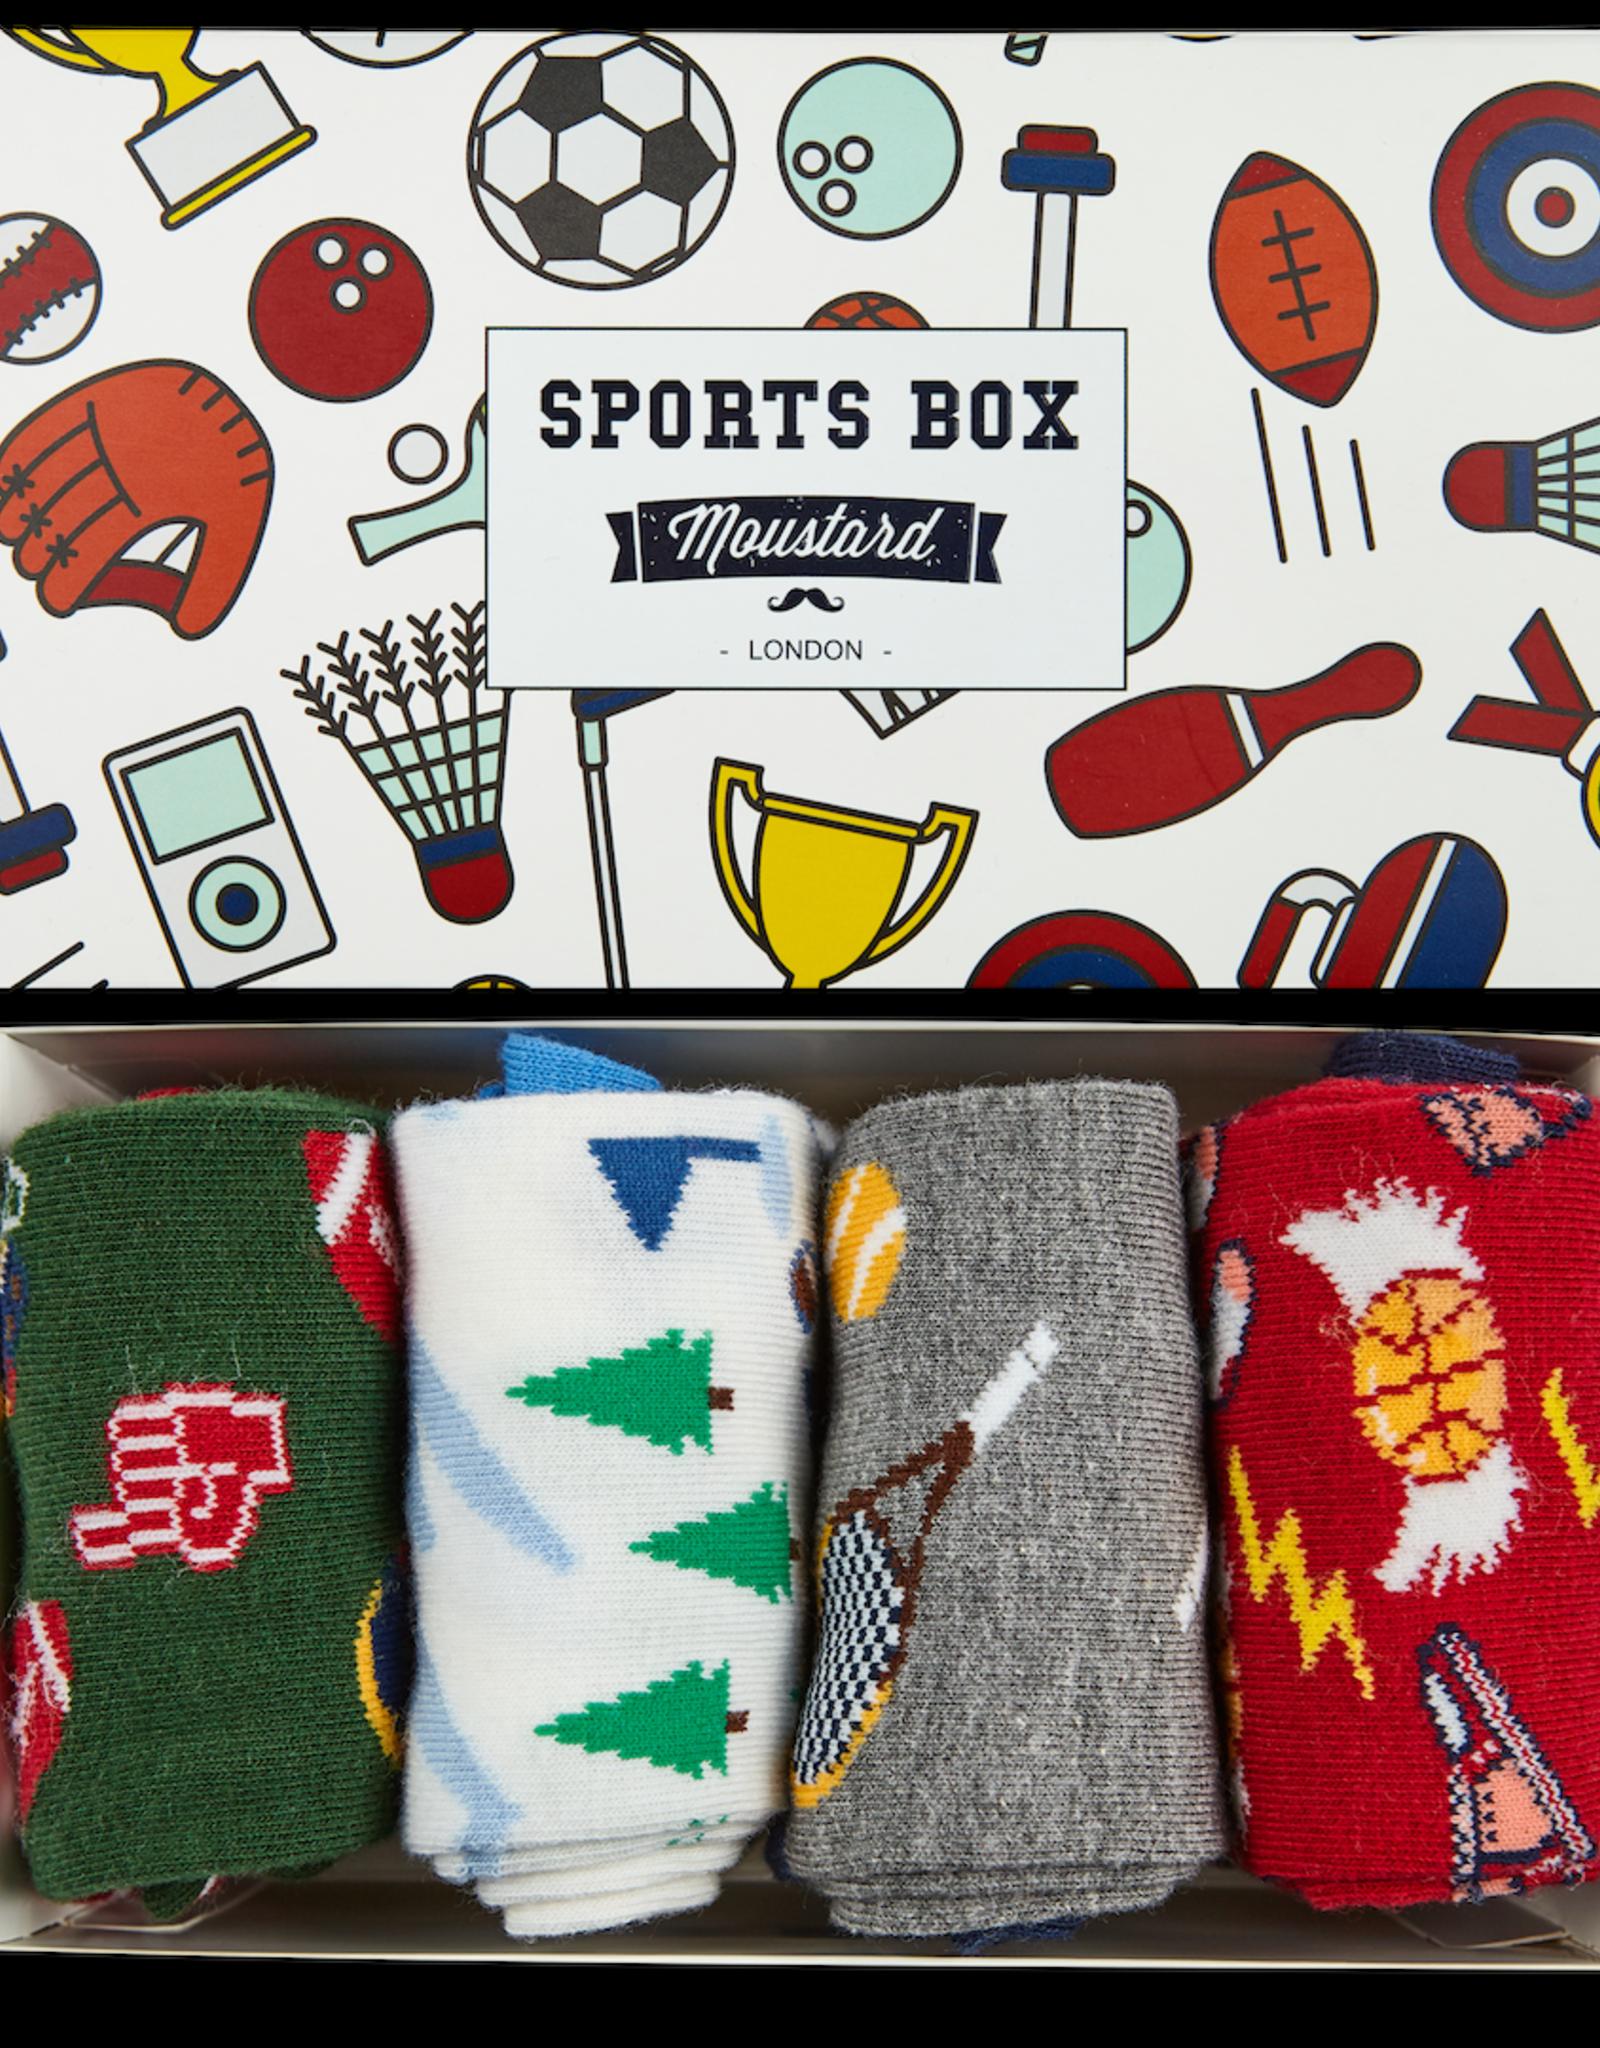 Moustard Moustard - Sports Box 41 - 46